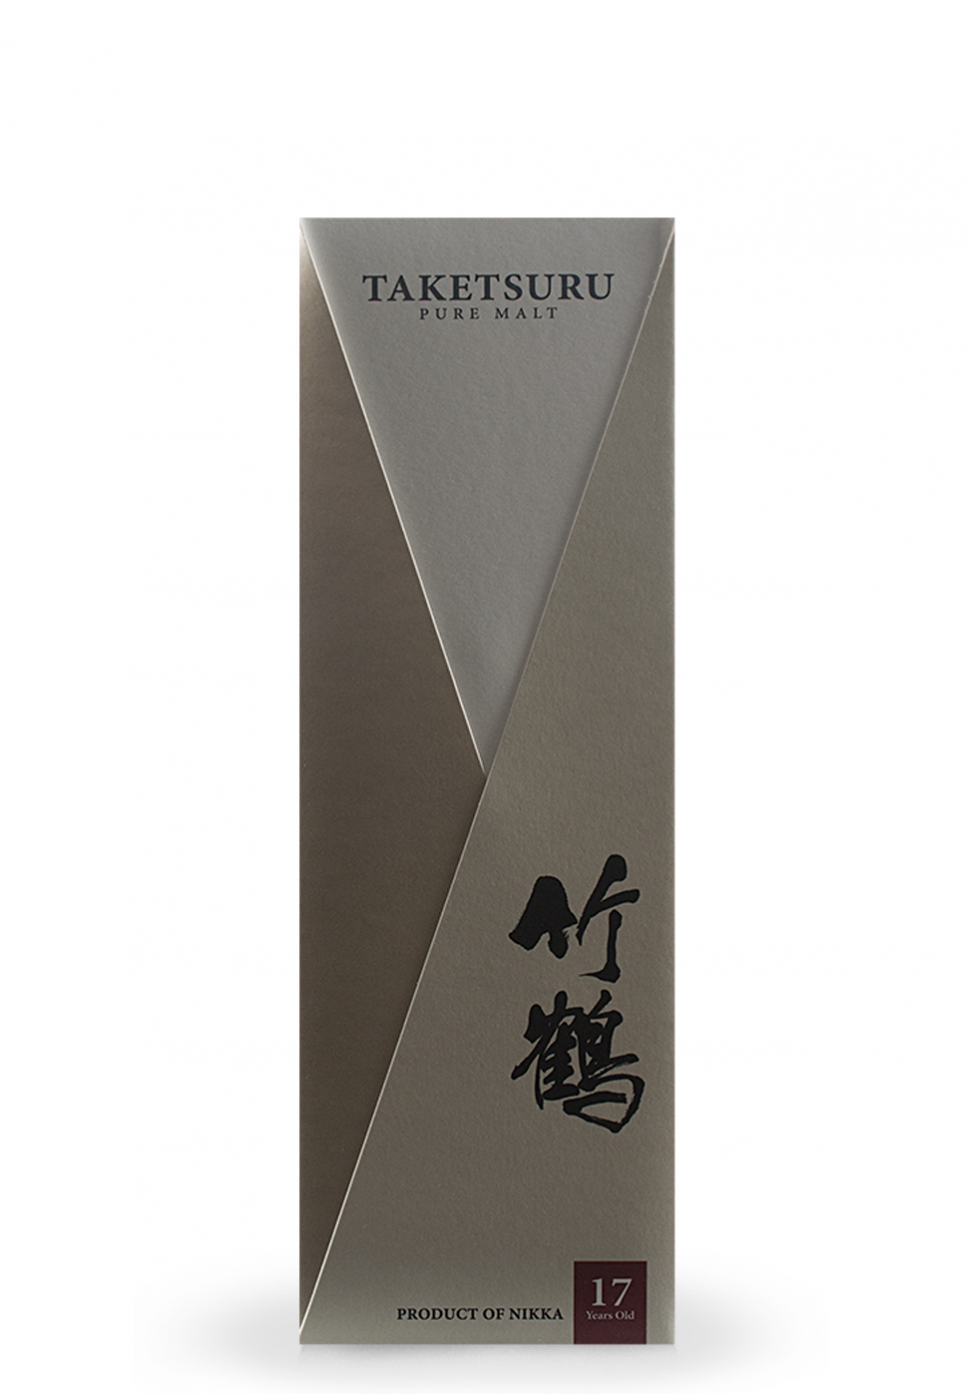 whisky nikka taketsuru